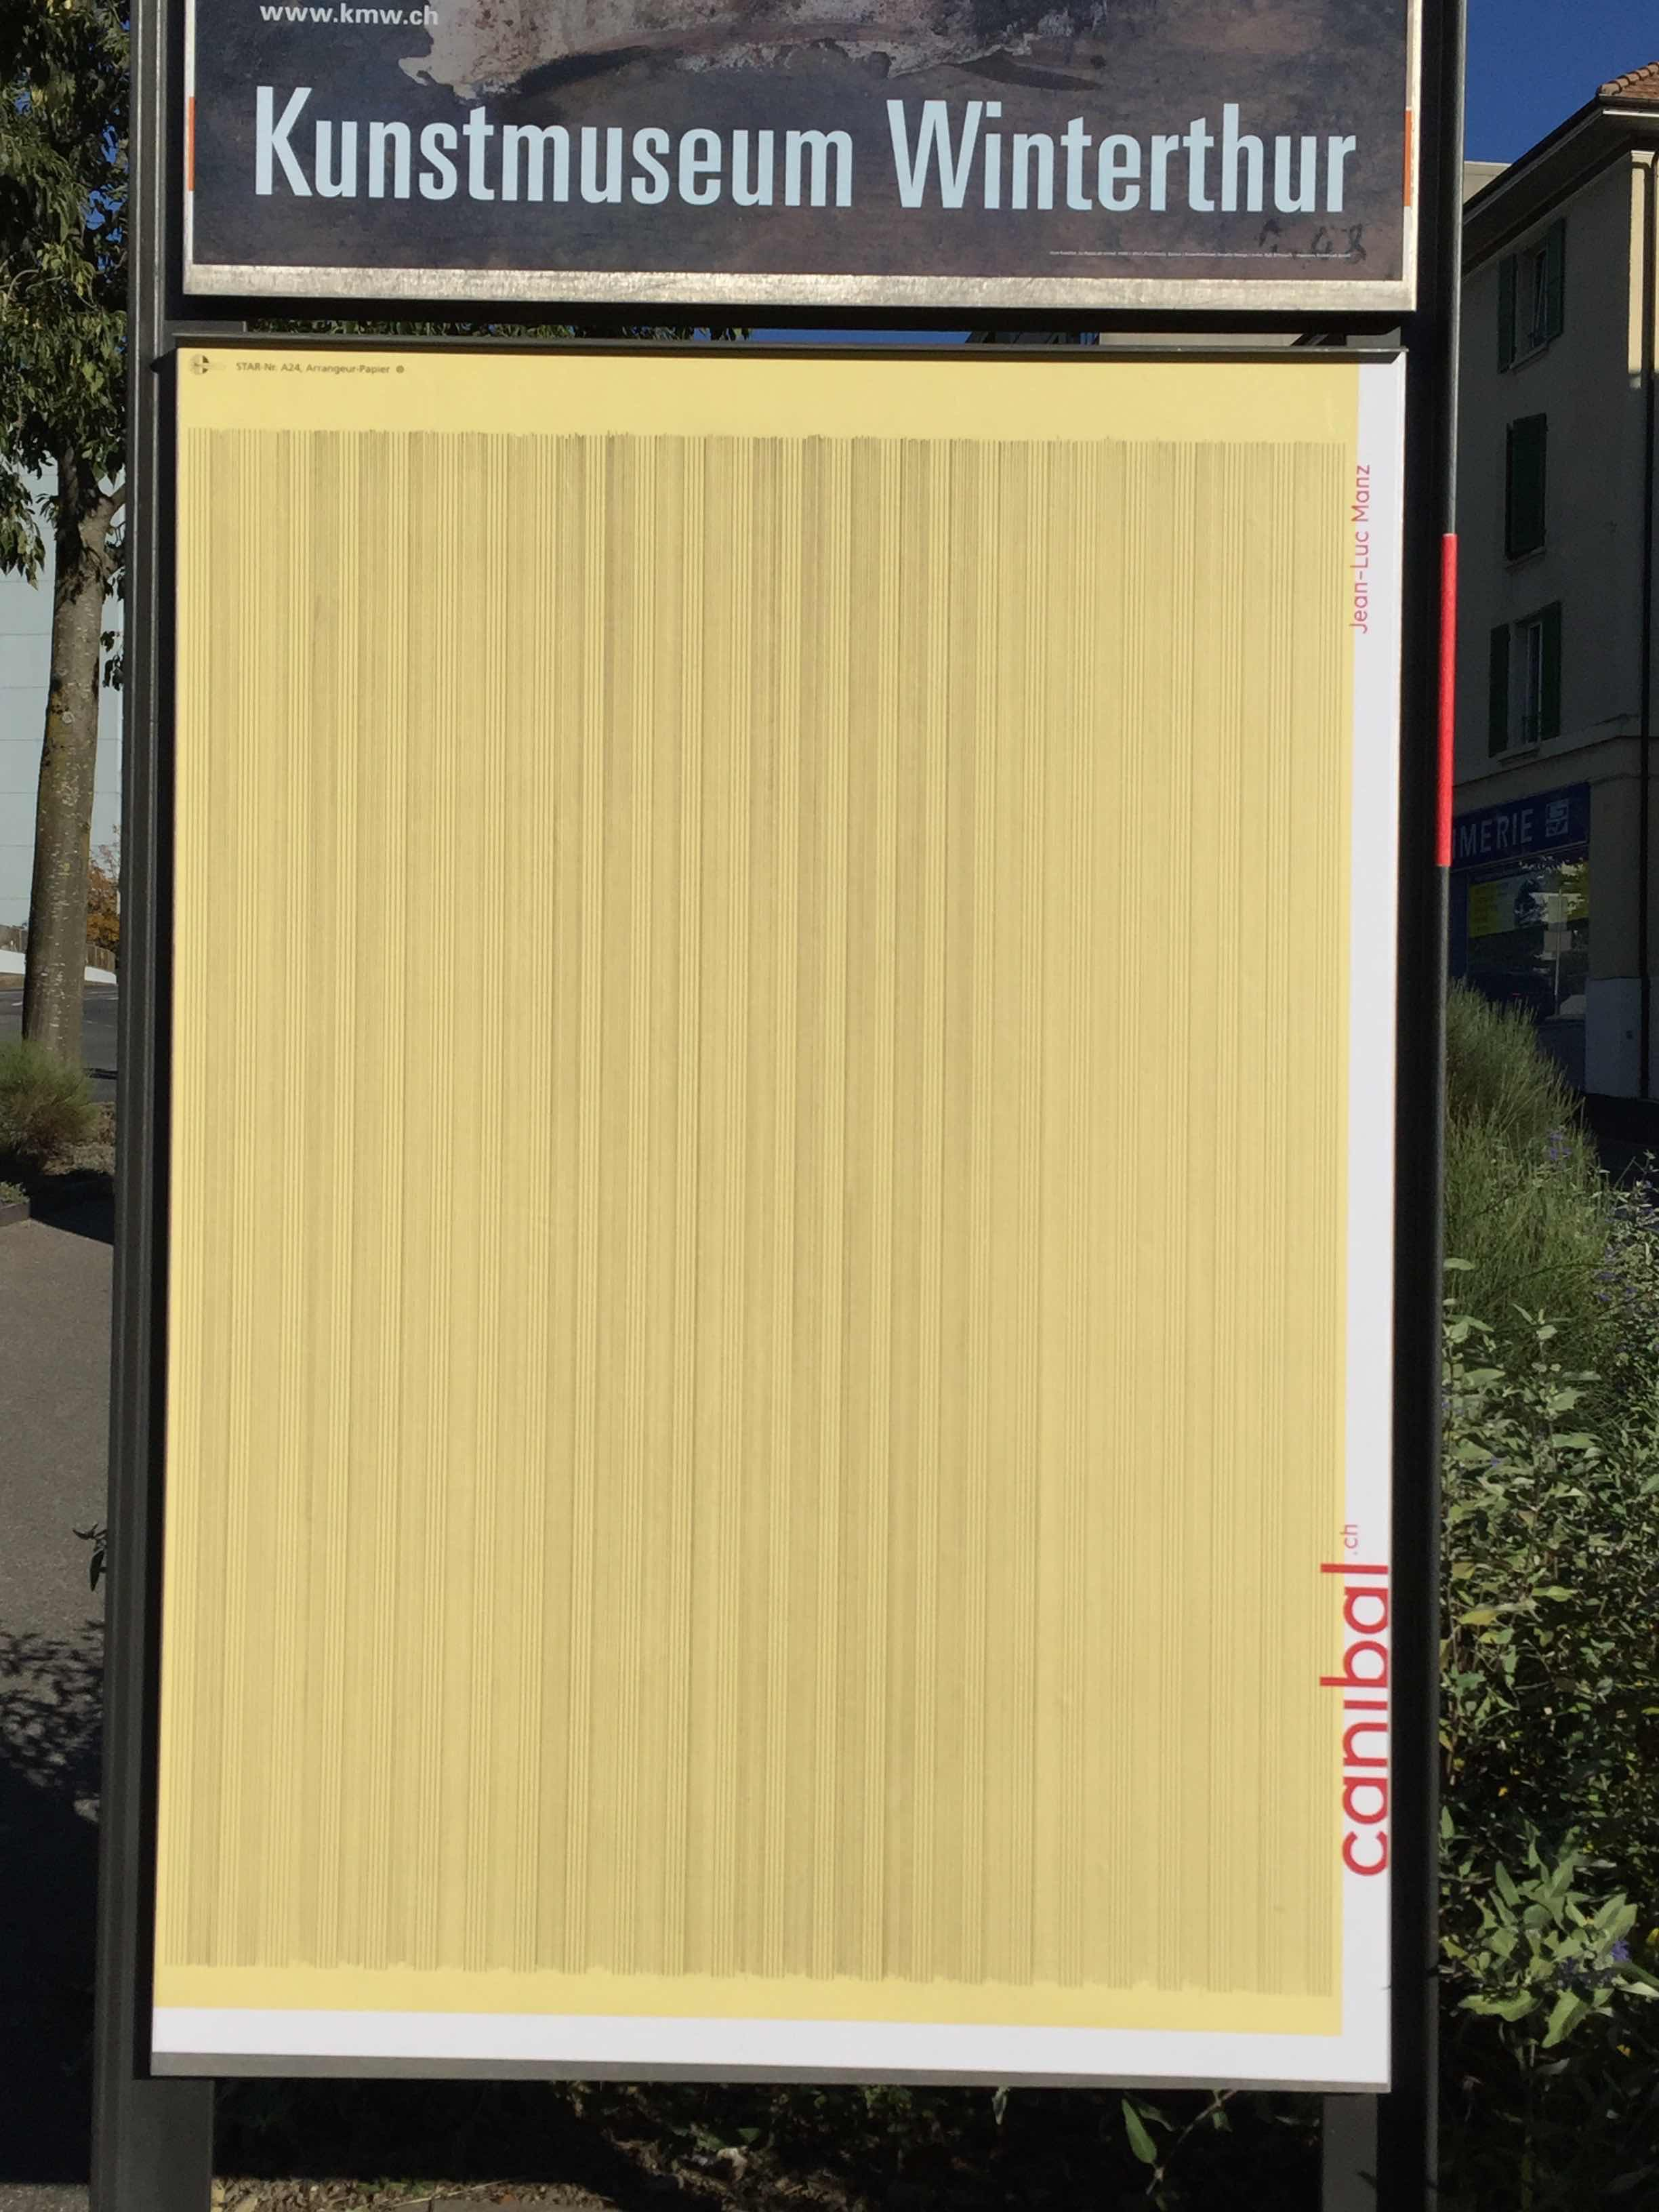 Jean-Luc Manz, avenue de tivoli 25, Lausanne-IMG_5893